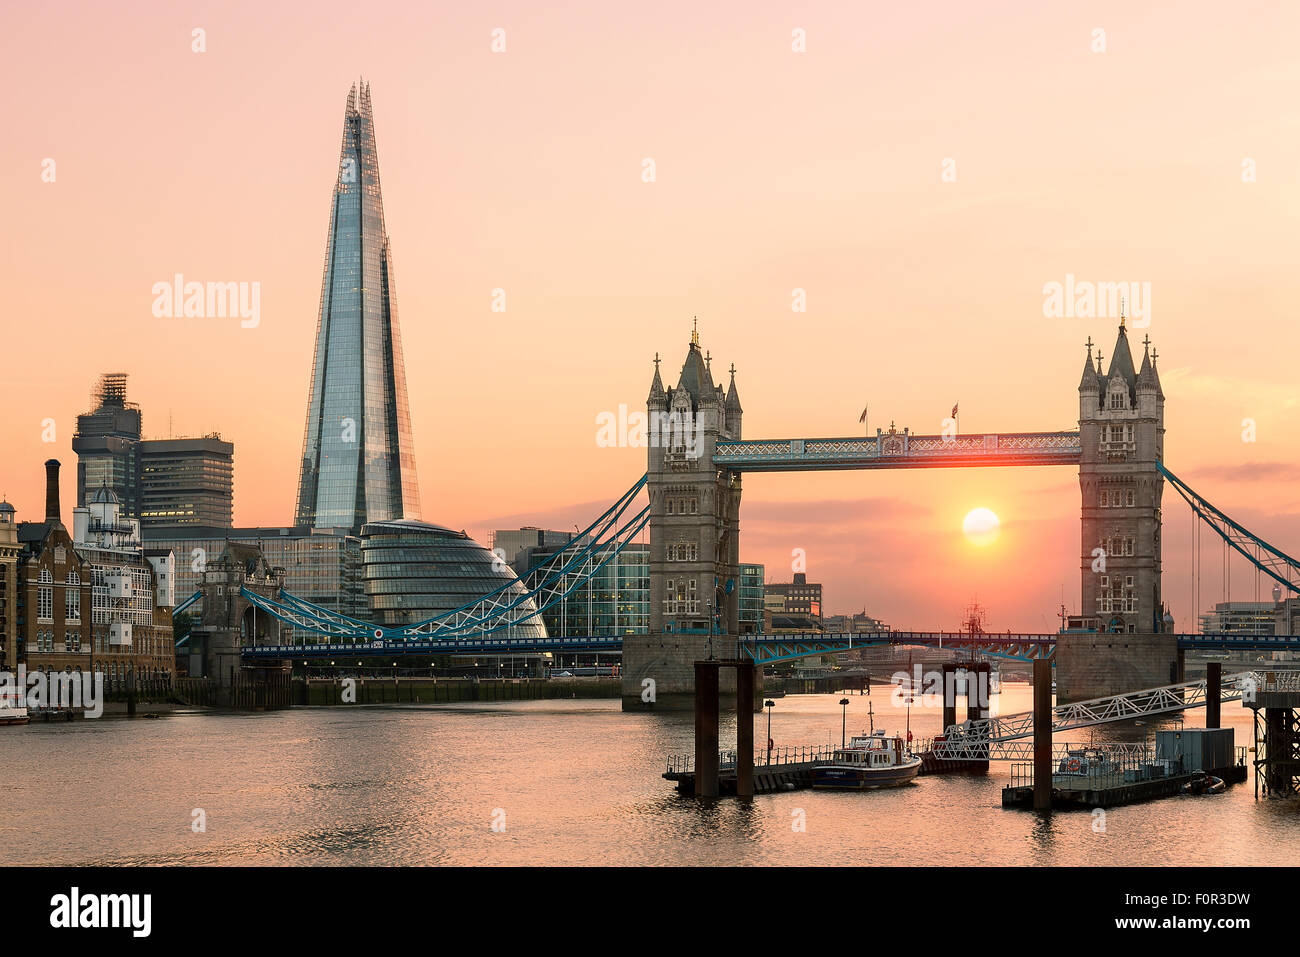 London, Tower Bridge und Shard London Bridge bei Sonnenuntergang Stockbild